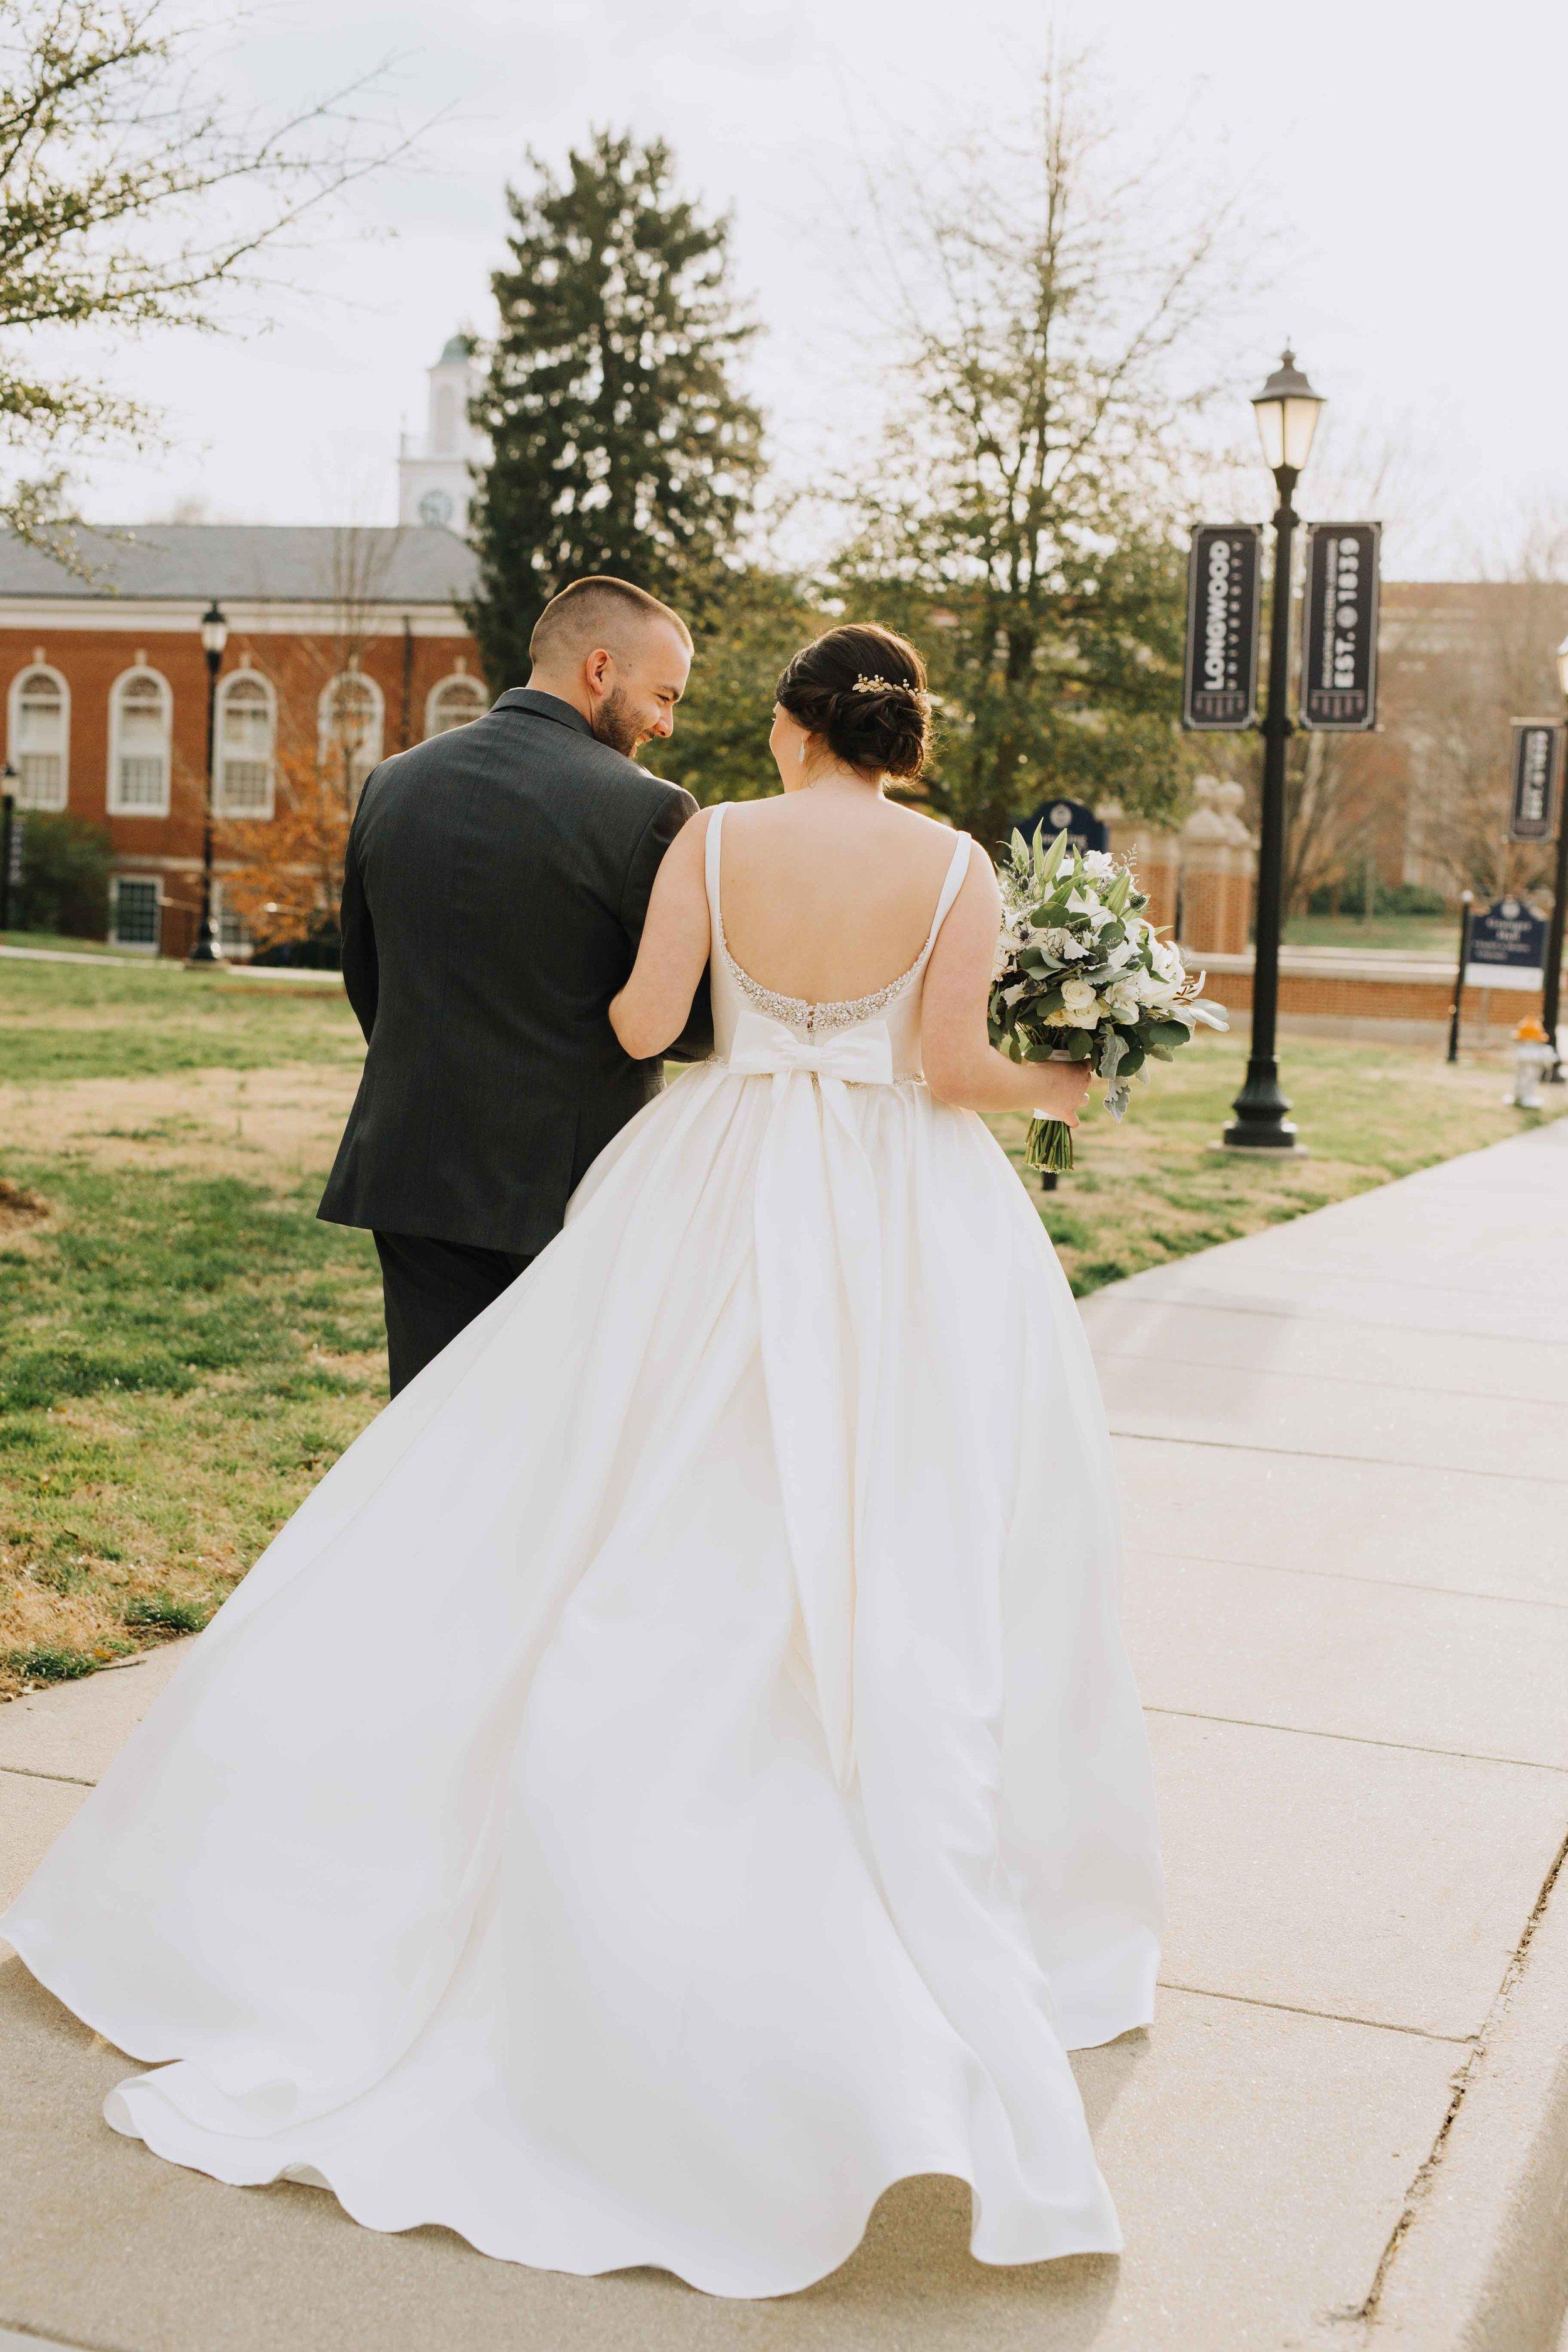 Farmville-Virginia-Wedding-Hotel-Weynoke-Downtown-Jacqueline-Waters-Photography-Detailed- (906).jpg